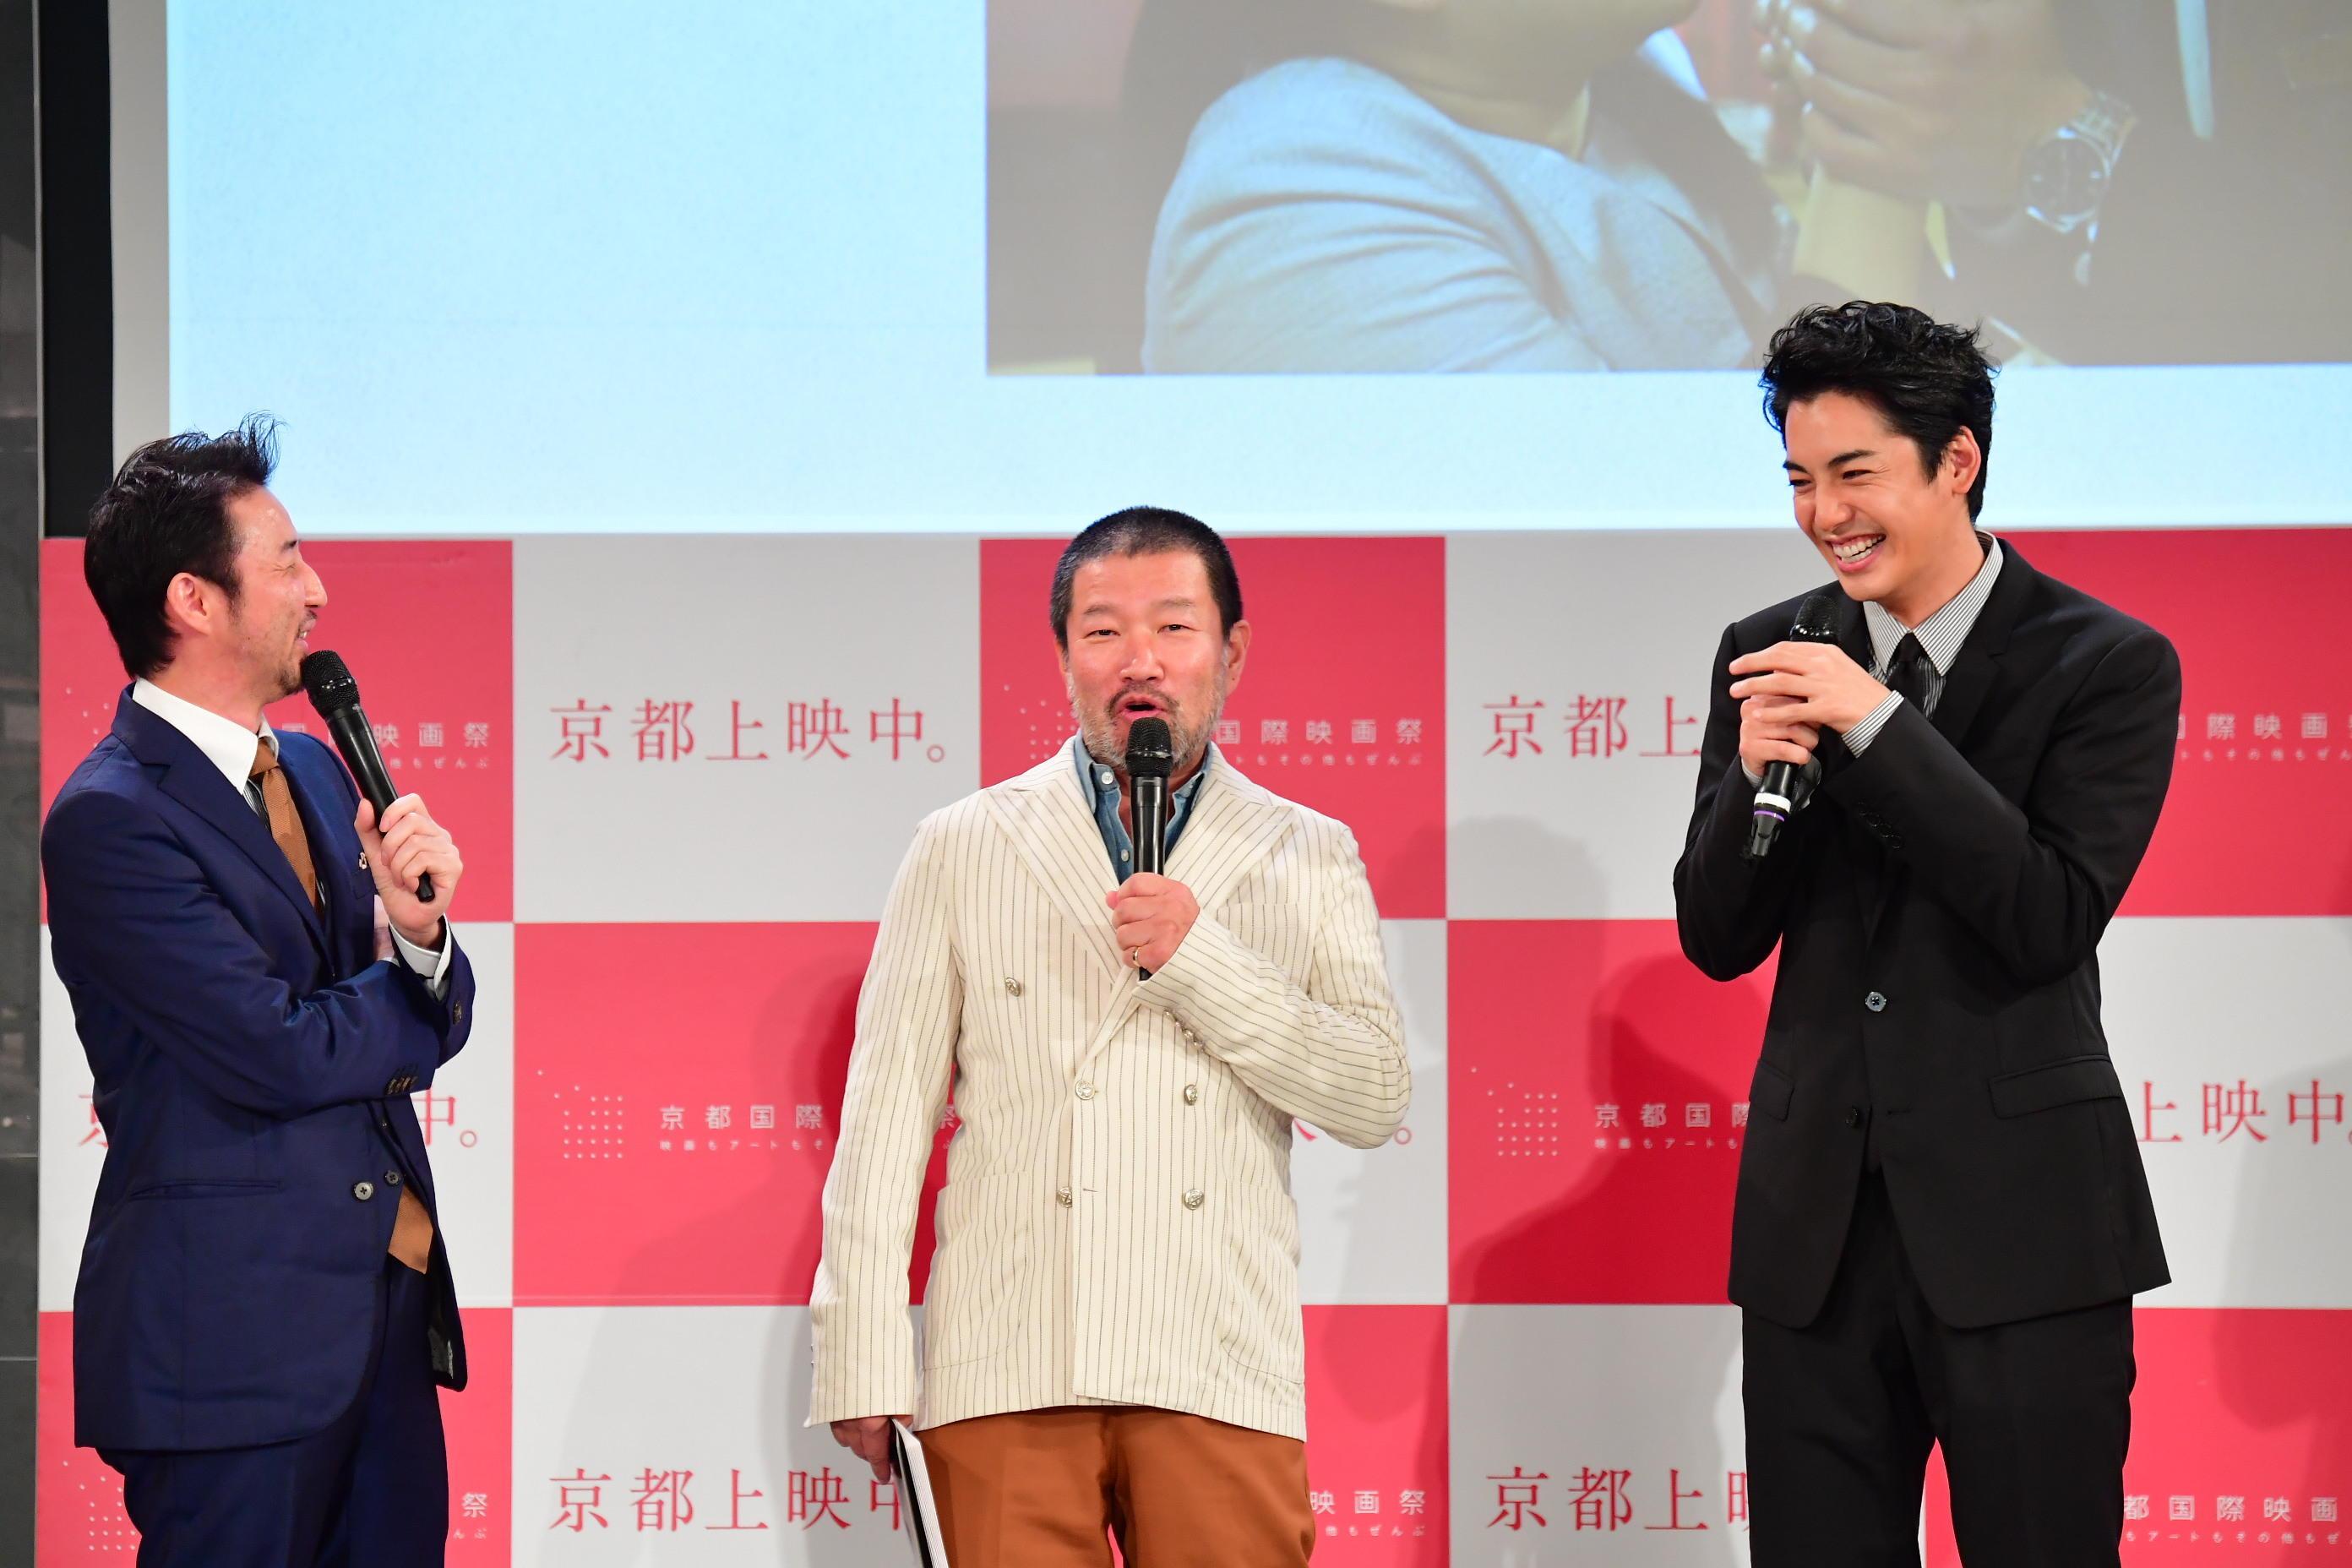 http://news.yoshimoto.co.jp/20180903233444-c3af3db9999612b16688c7200c9309c94b31194f.jpg